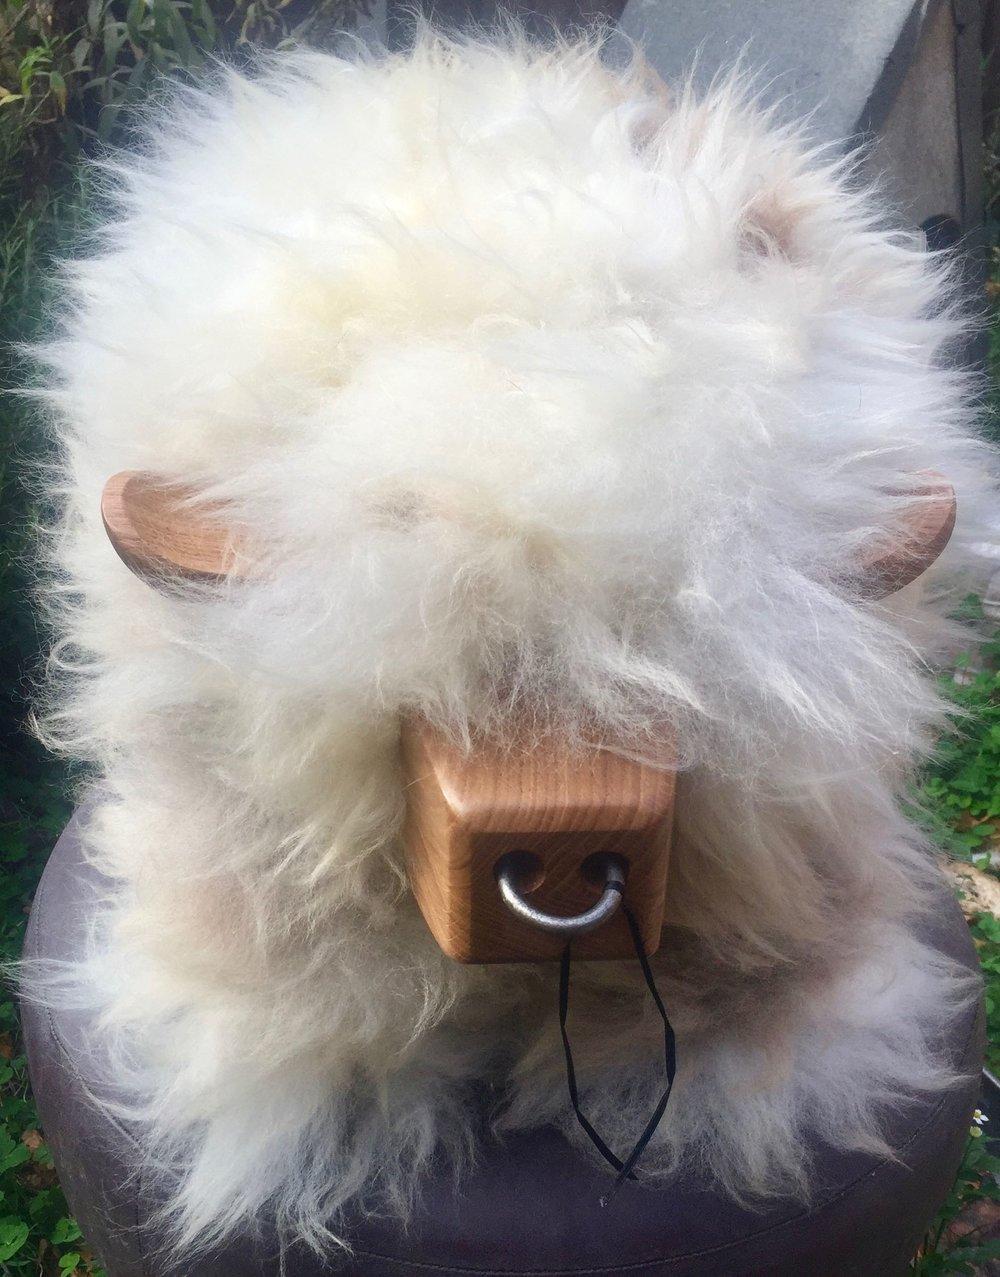 Organically tanned British sheepskin by Nicky Prt.